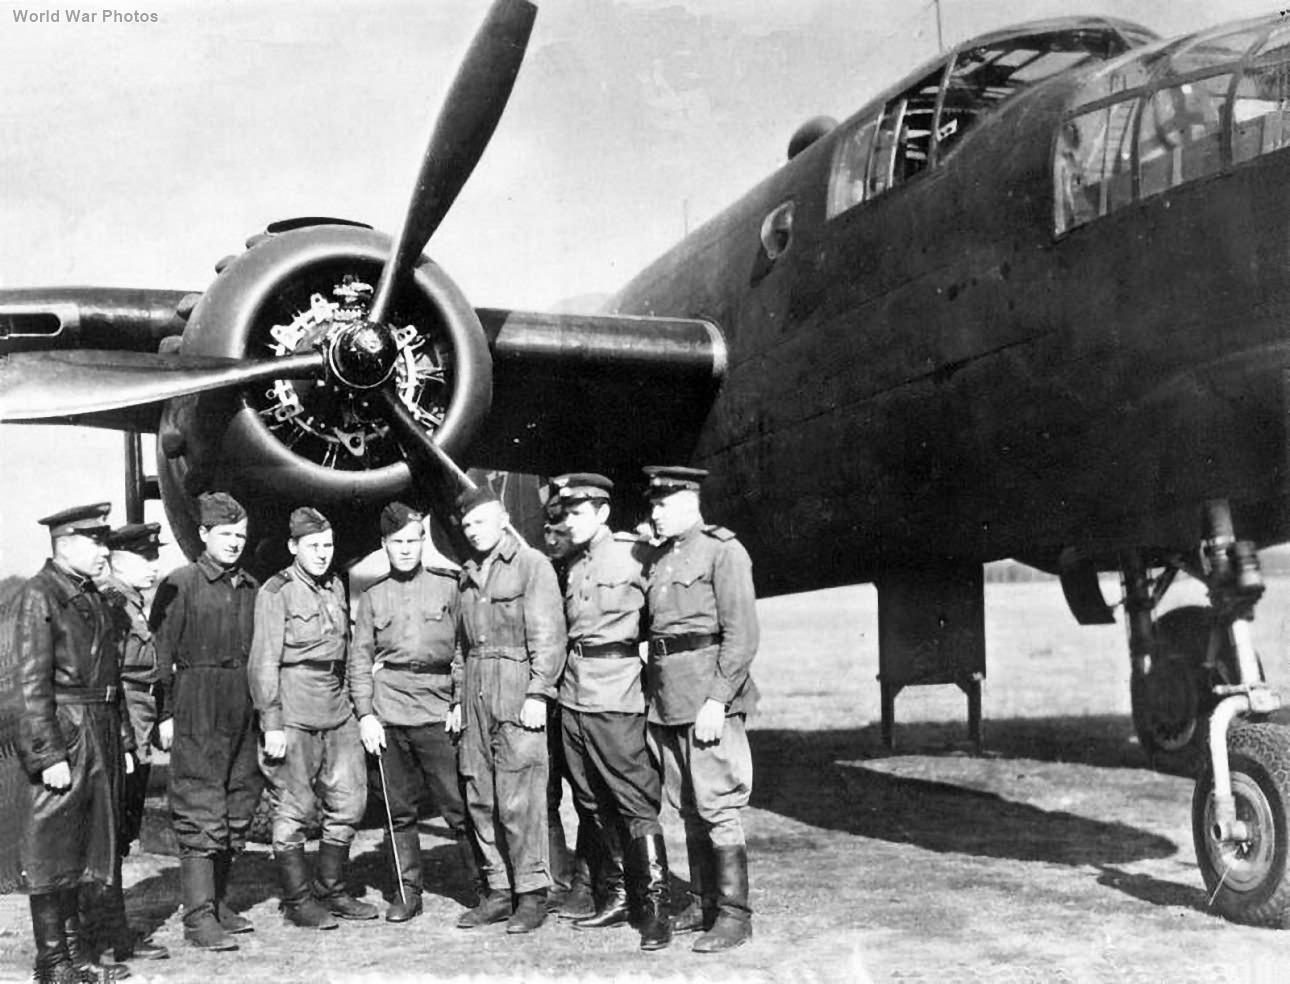 Soviet B-25 of the 13 BAP